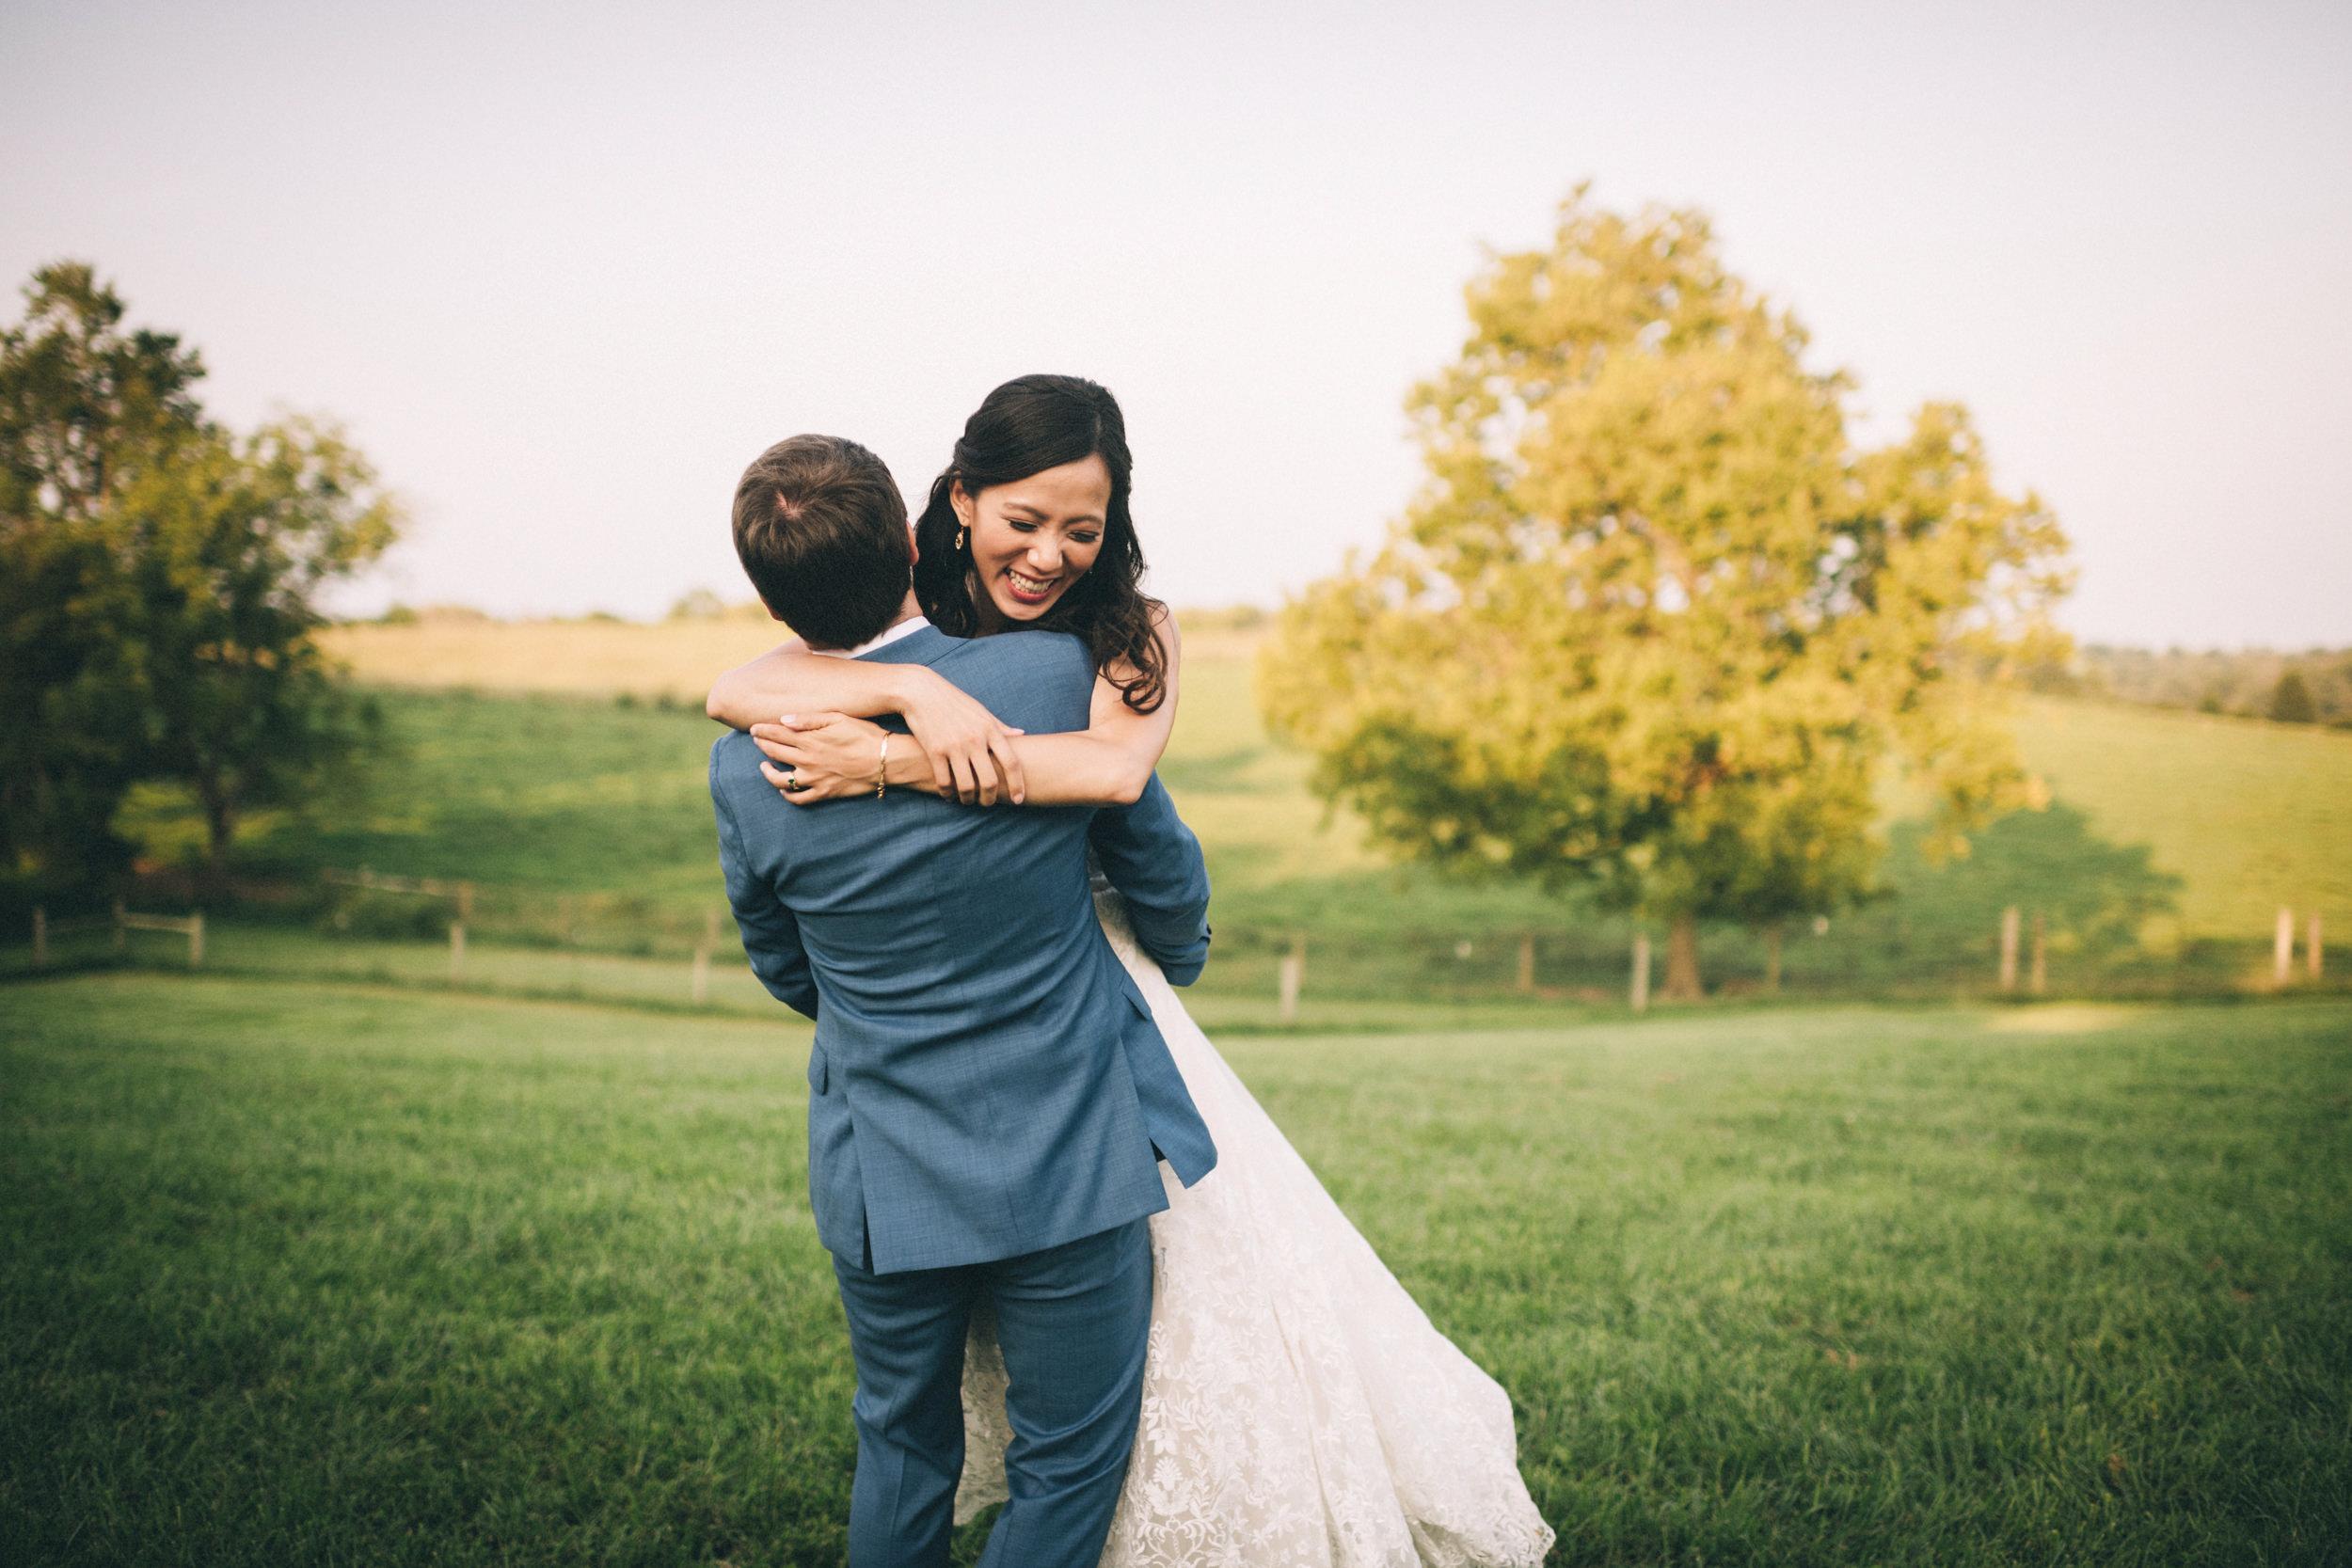 Louisville-Kentucky-Wedding-and-Elopement-Photographer-Sarah-Katherine-Davis-Photography-Summer-Jewel-Toned-Wedding-Chineese-Tea-Ceremony-Warrenwood-Manor-Danville-752.jpg